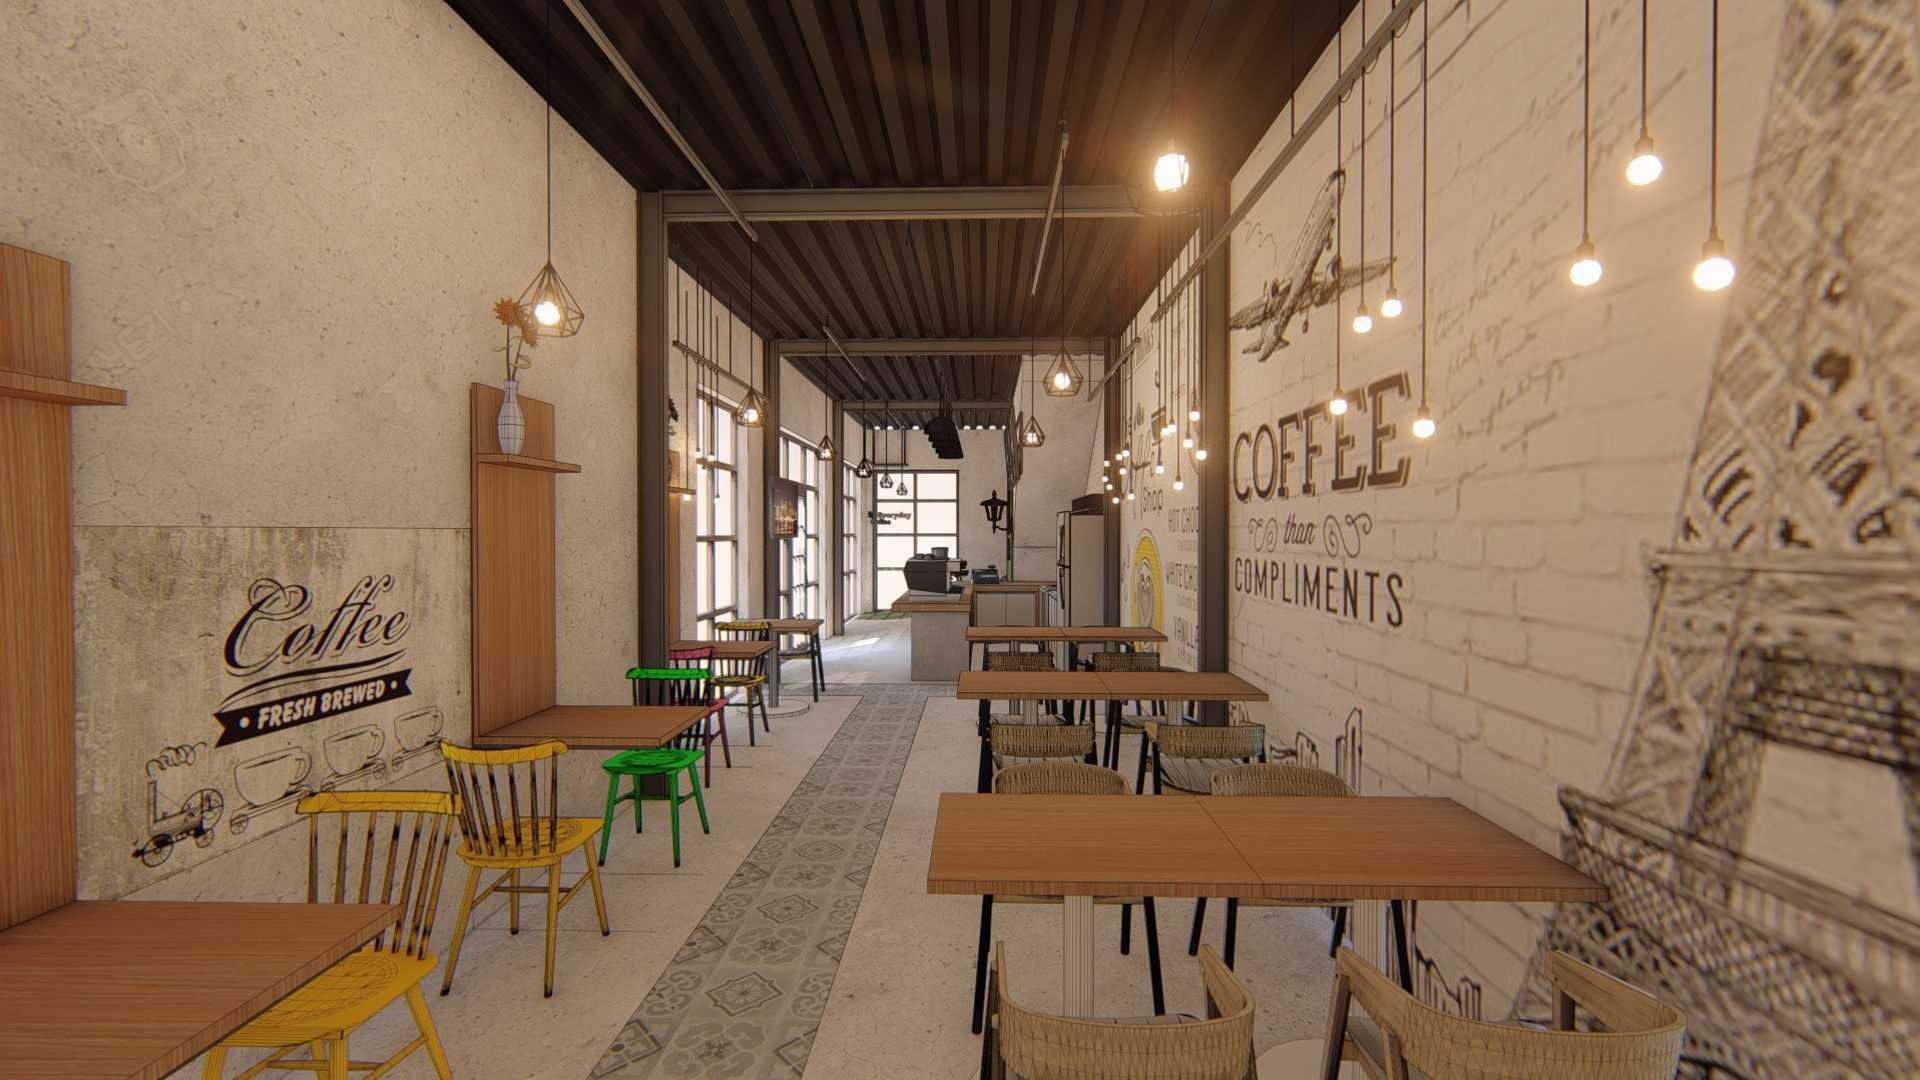 Hasymi Alfacru Caffee Industrial Jawa Timur, Indonesia Jawa Timur, Indonesia Hasymi-Alfacru-Caffee-Industrial   113748